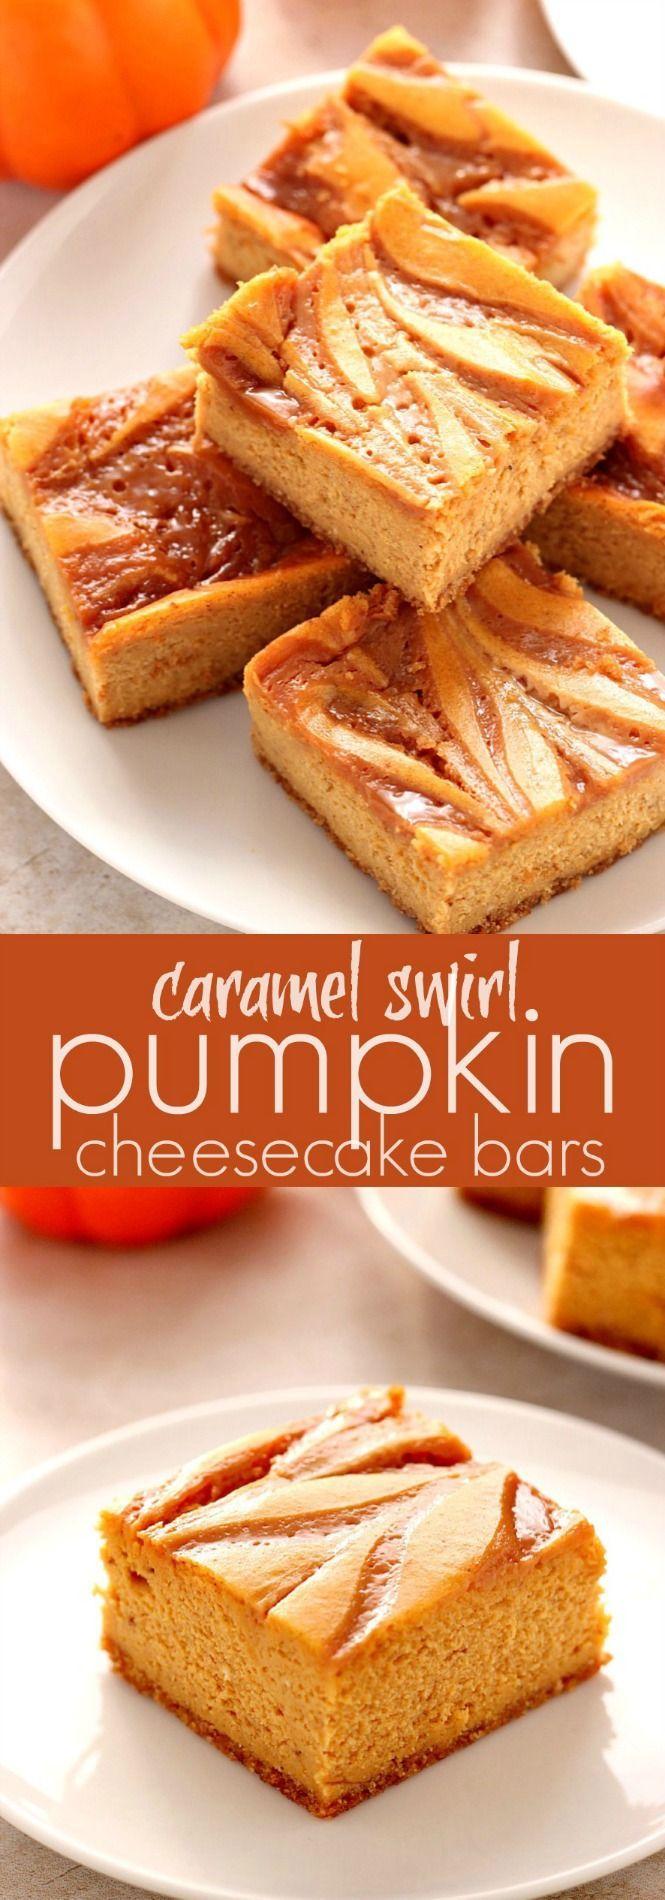 Swirl Pumpkin Cheesecake Bars - sweet and creamy cheesecake bars ...